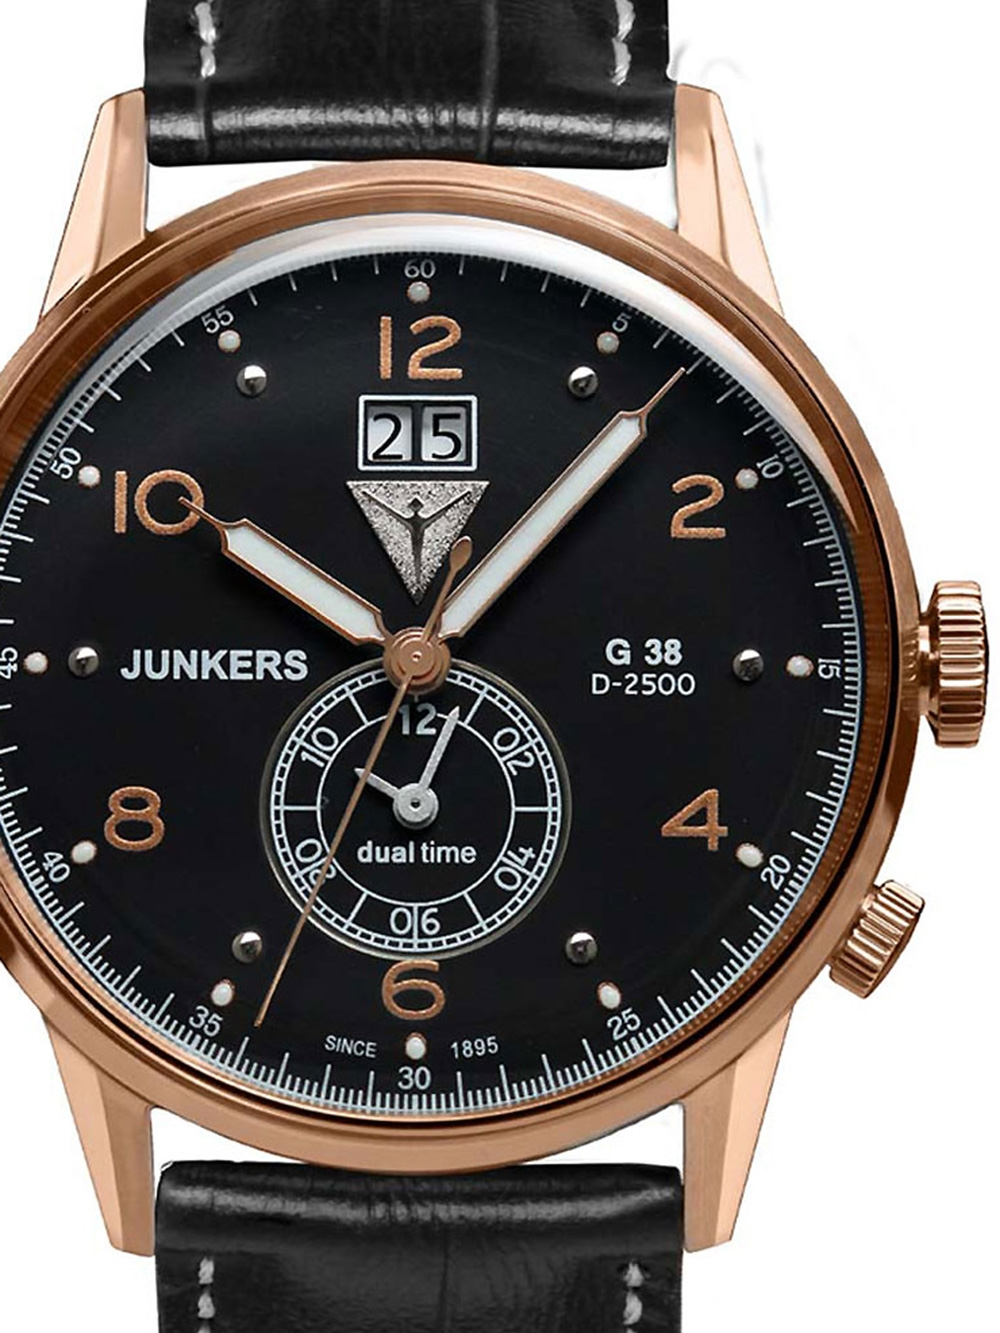 Junkers 6942 5 G38 Dual Time Herrenuhr 42mm 10ATM